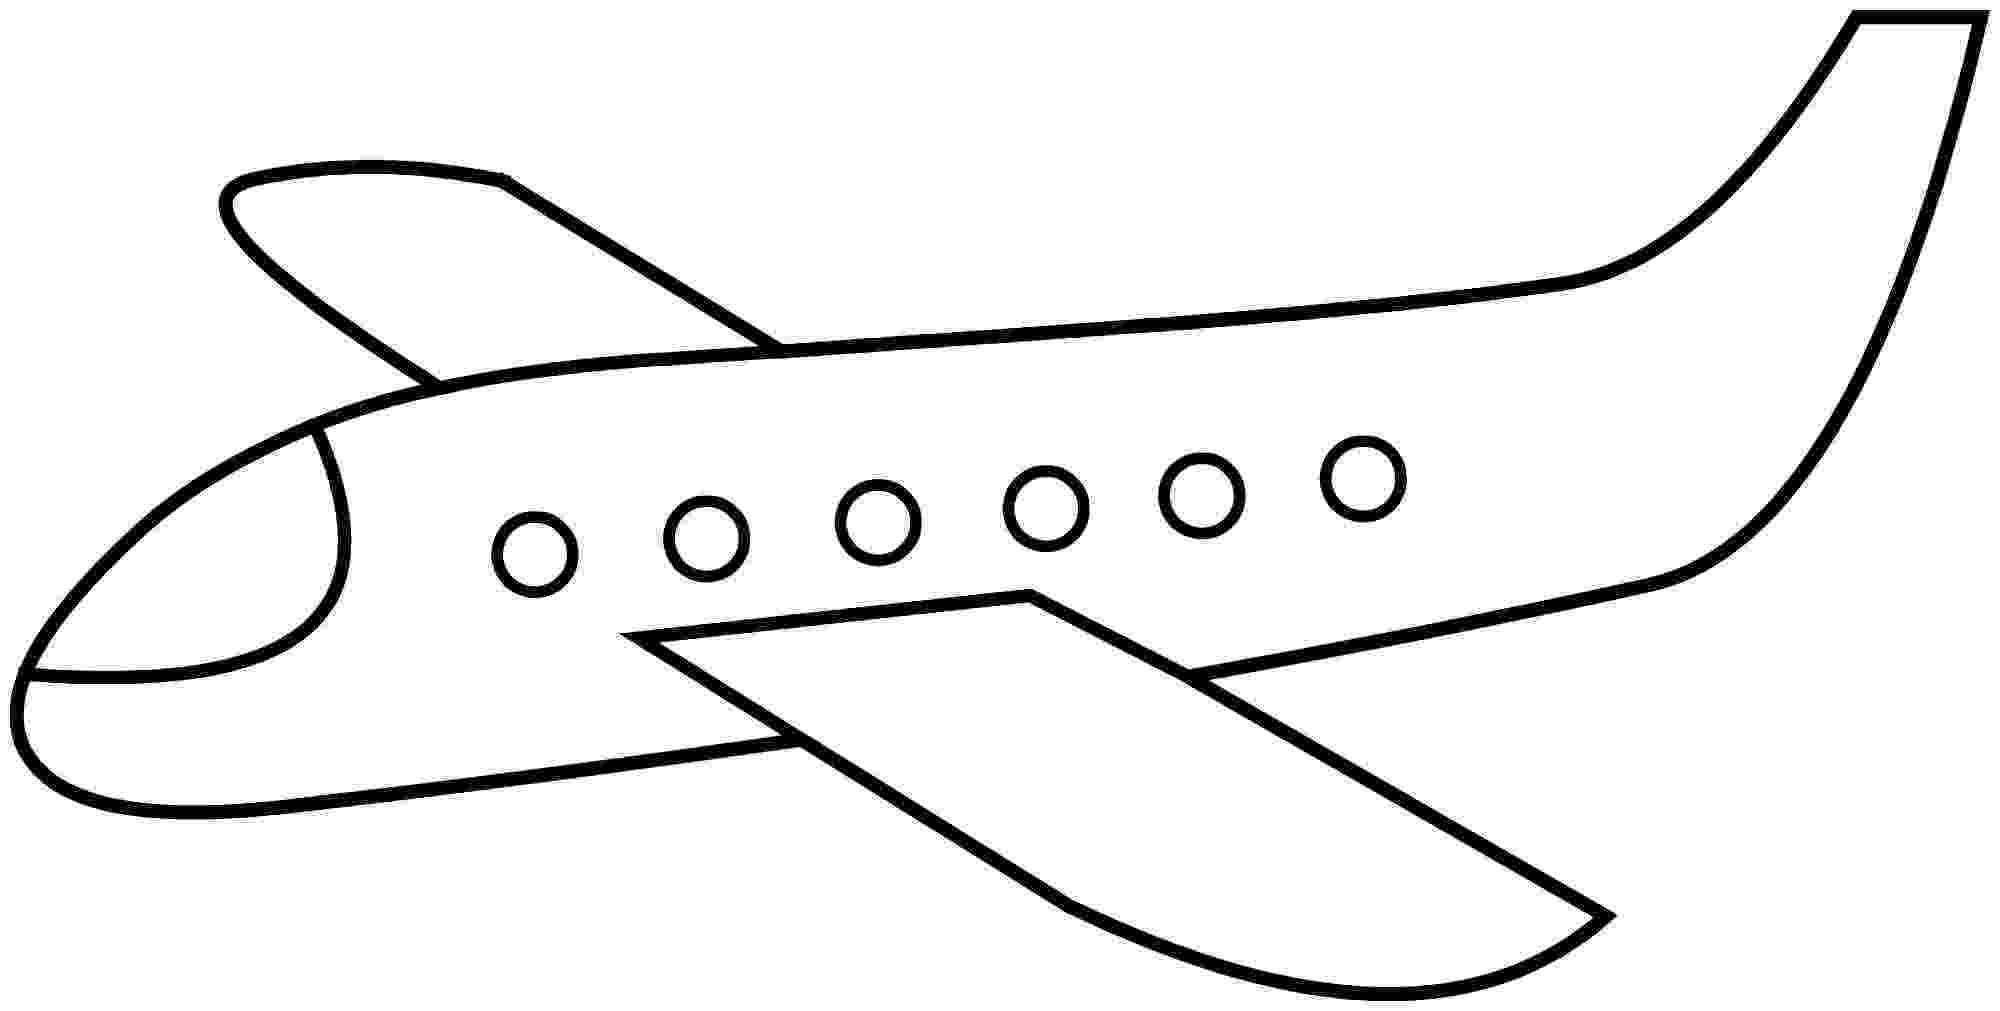 coloring page airplane vintage airplane coloring pages bestappsforkidscom page coloring airplane